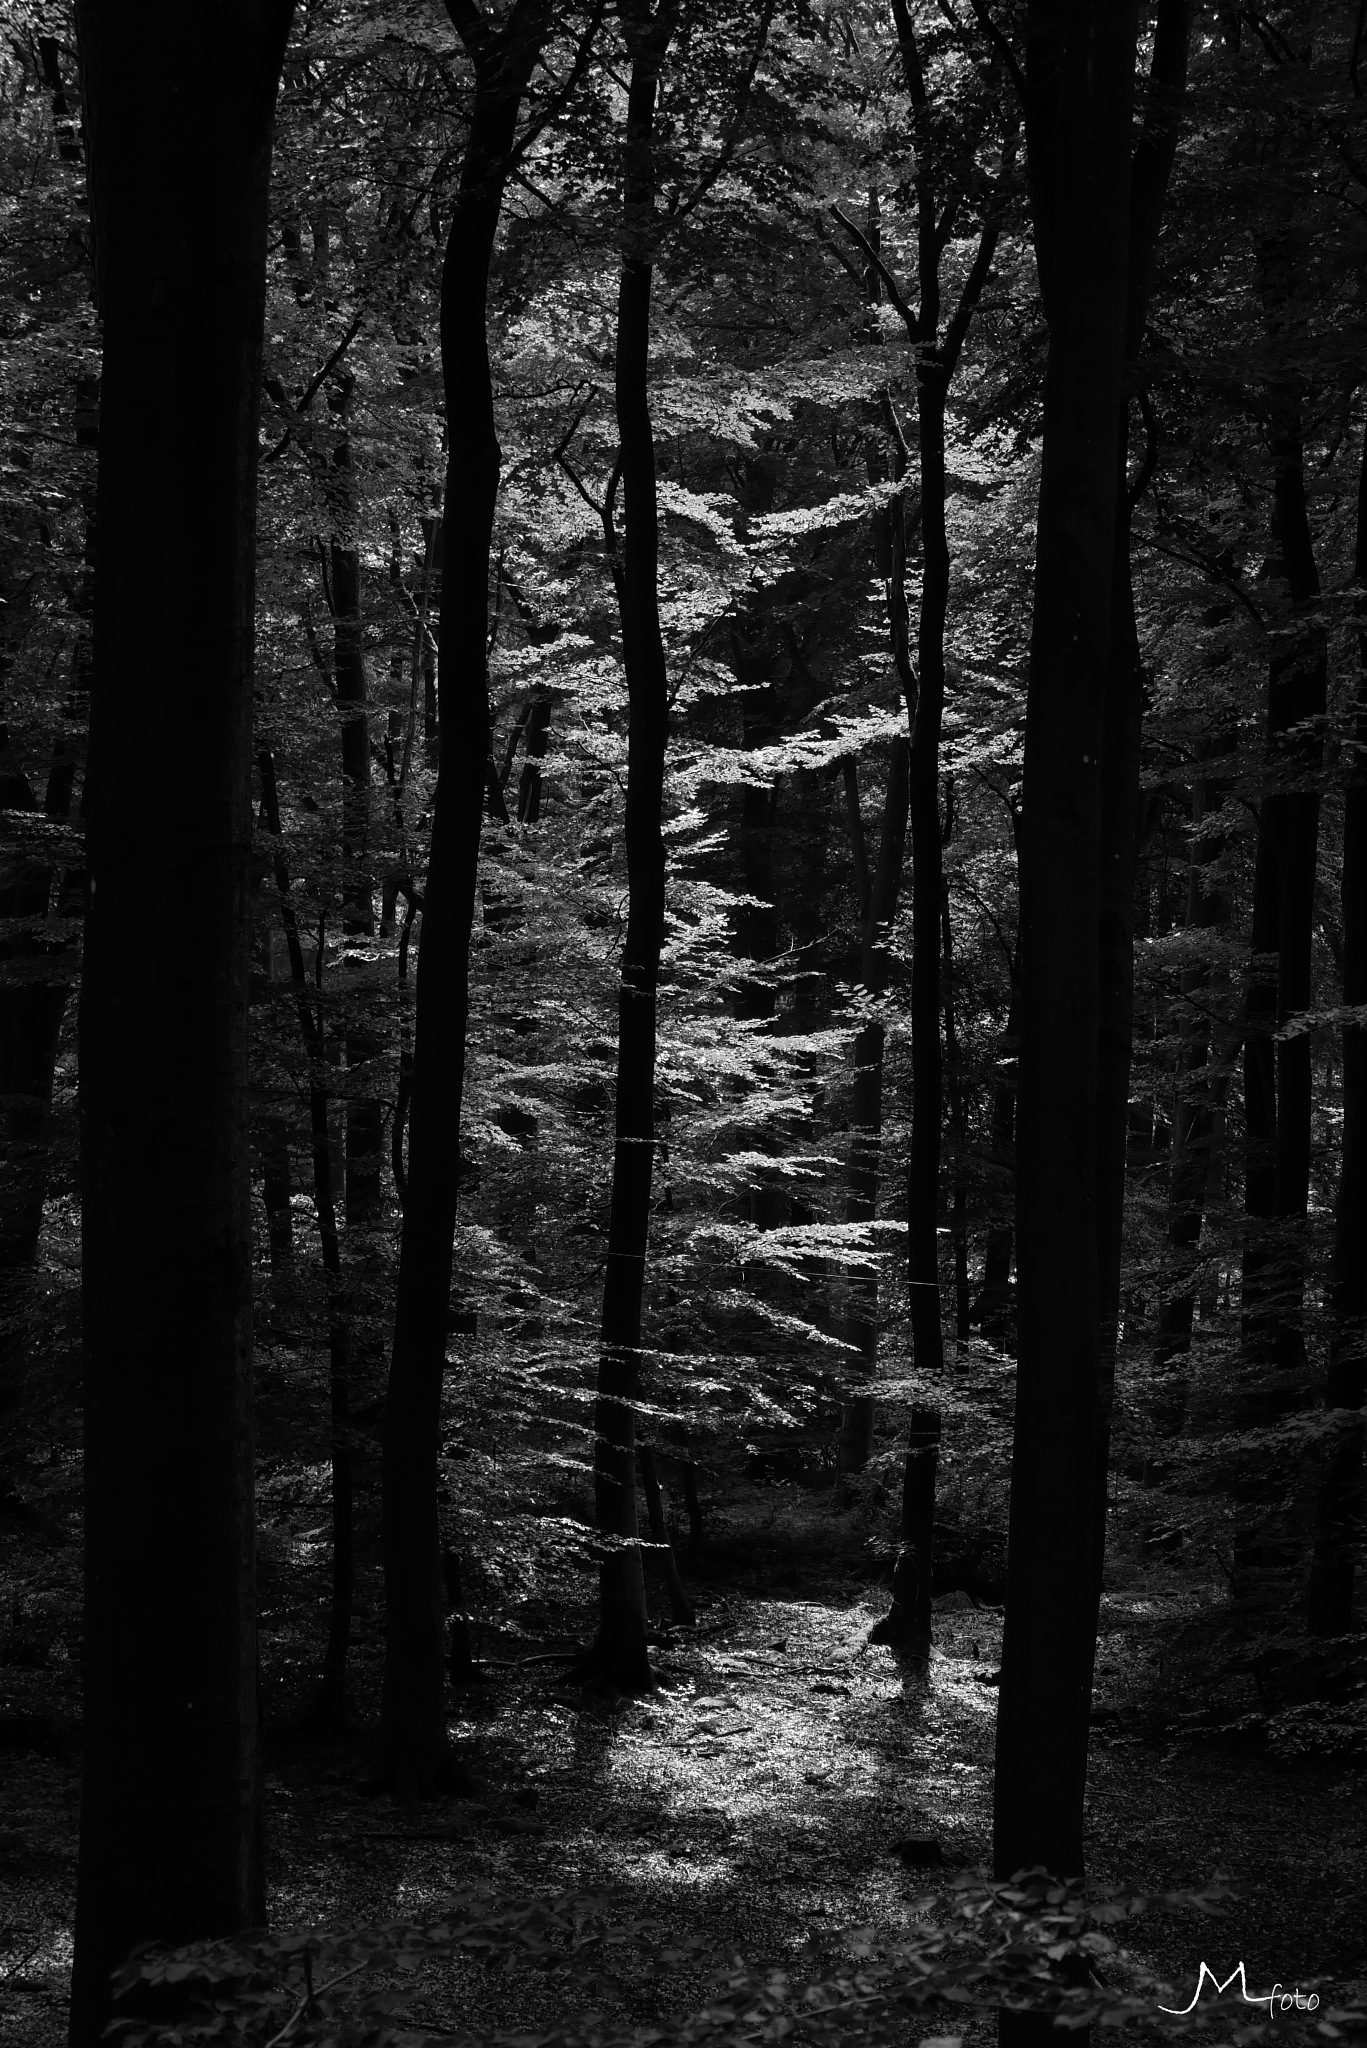 Shadows 2 by JMLart